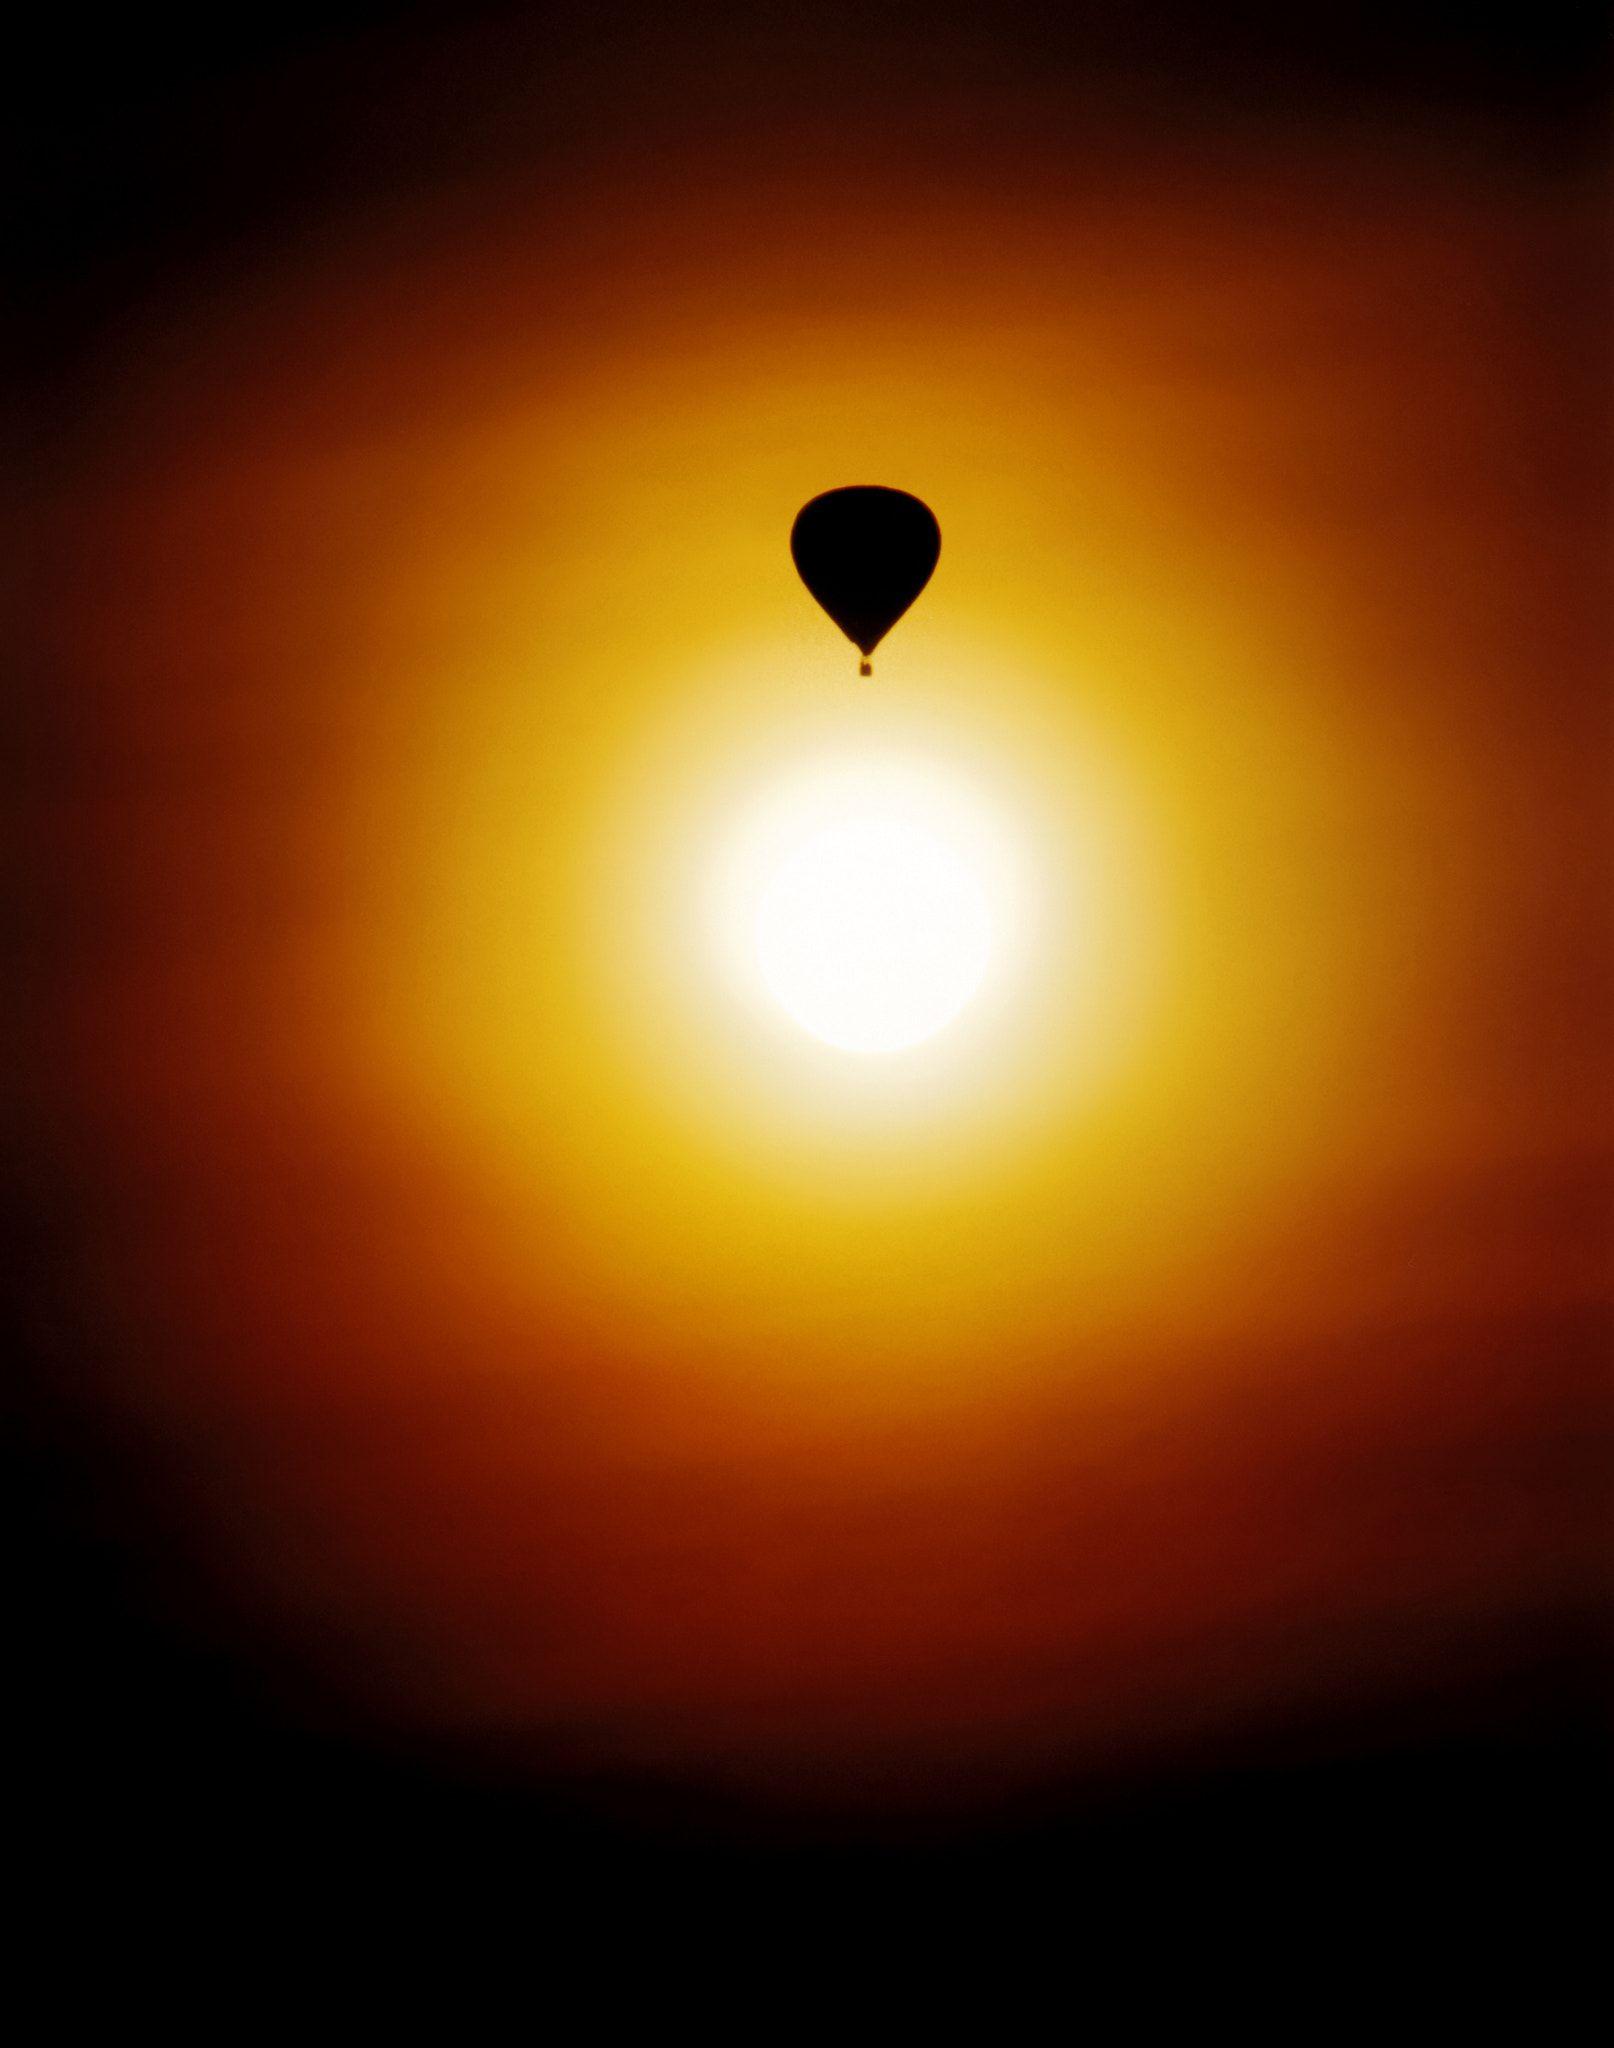 Hot Air Balloon 22 In Sunset